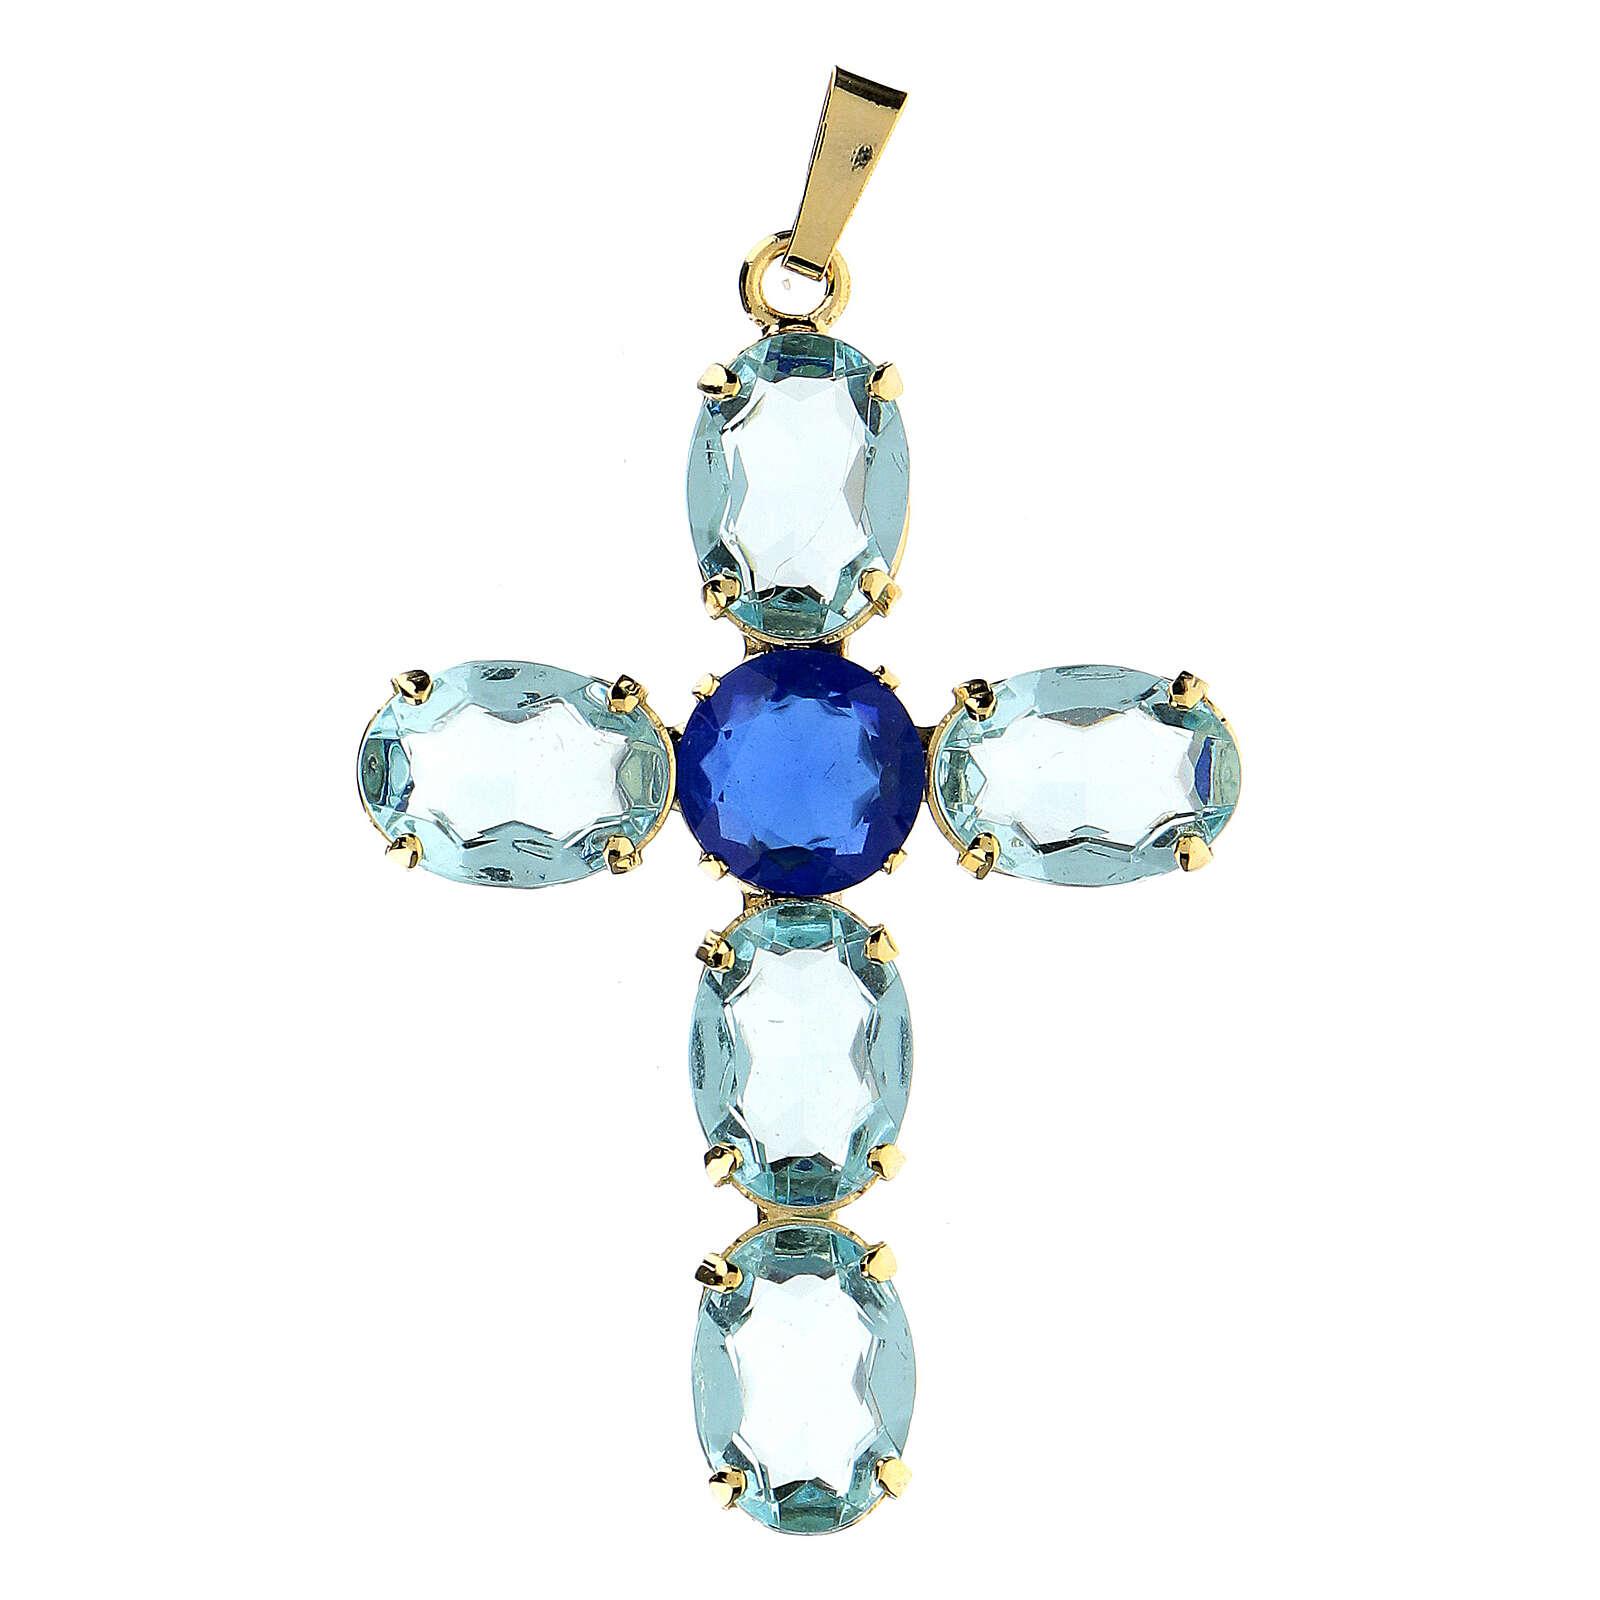 Colgante cruz cristal turquesa ovalada 4